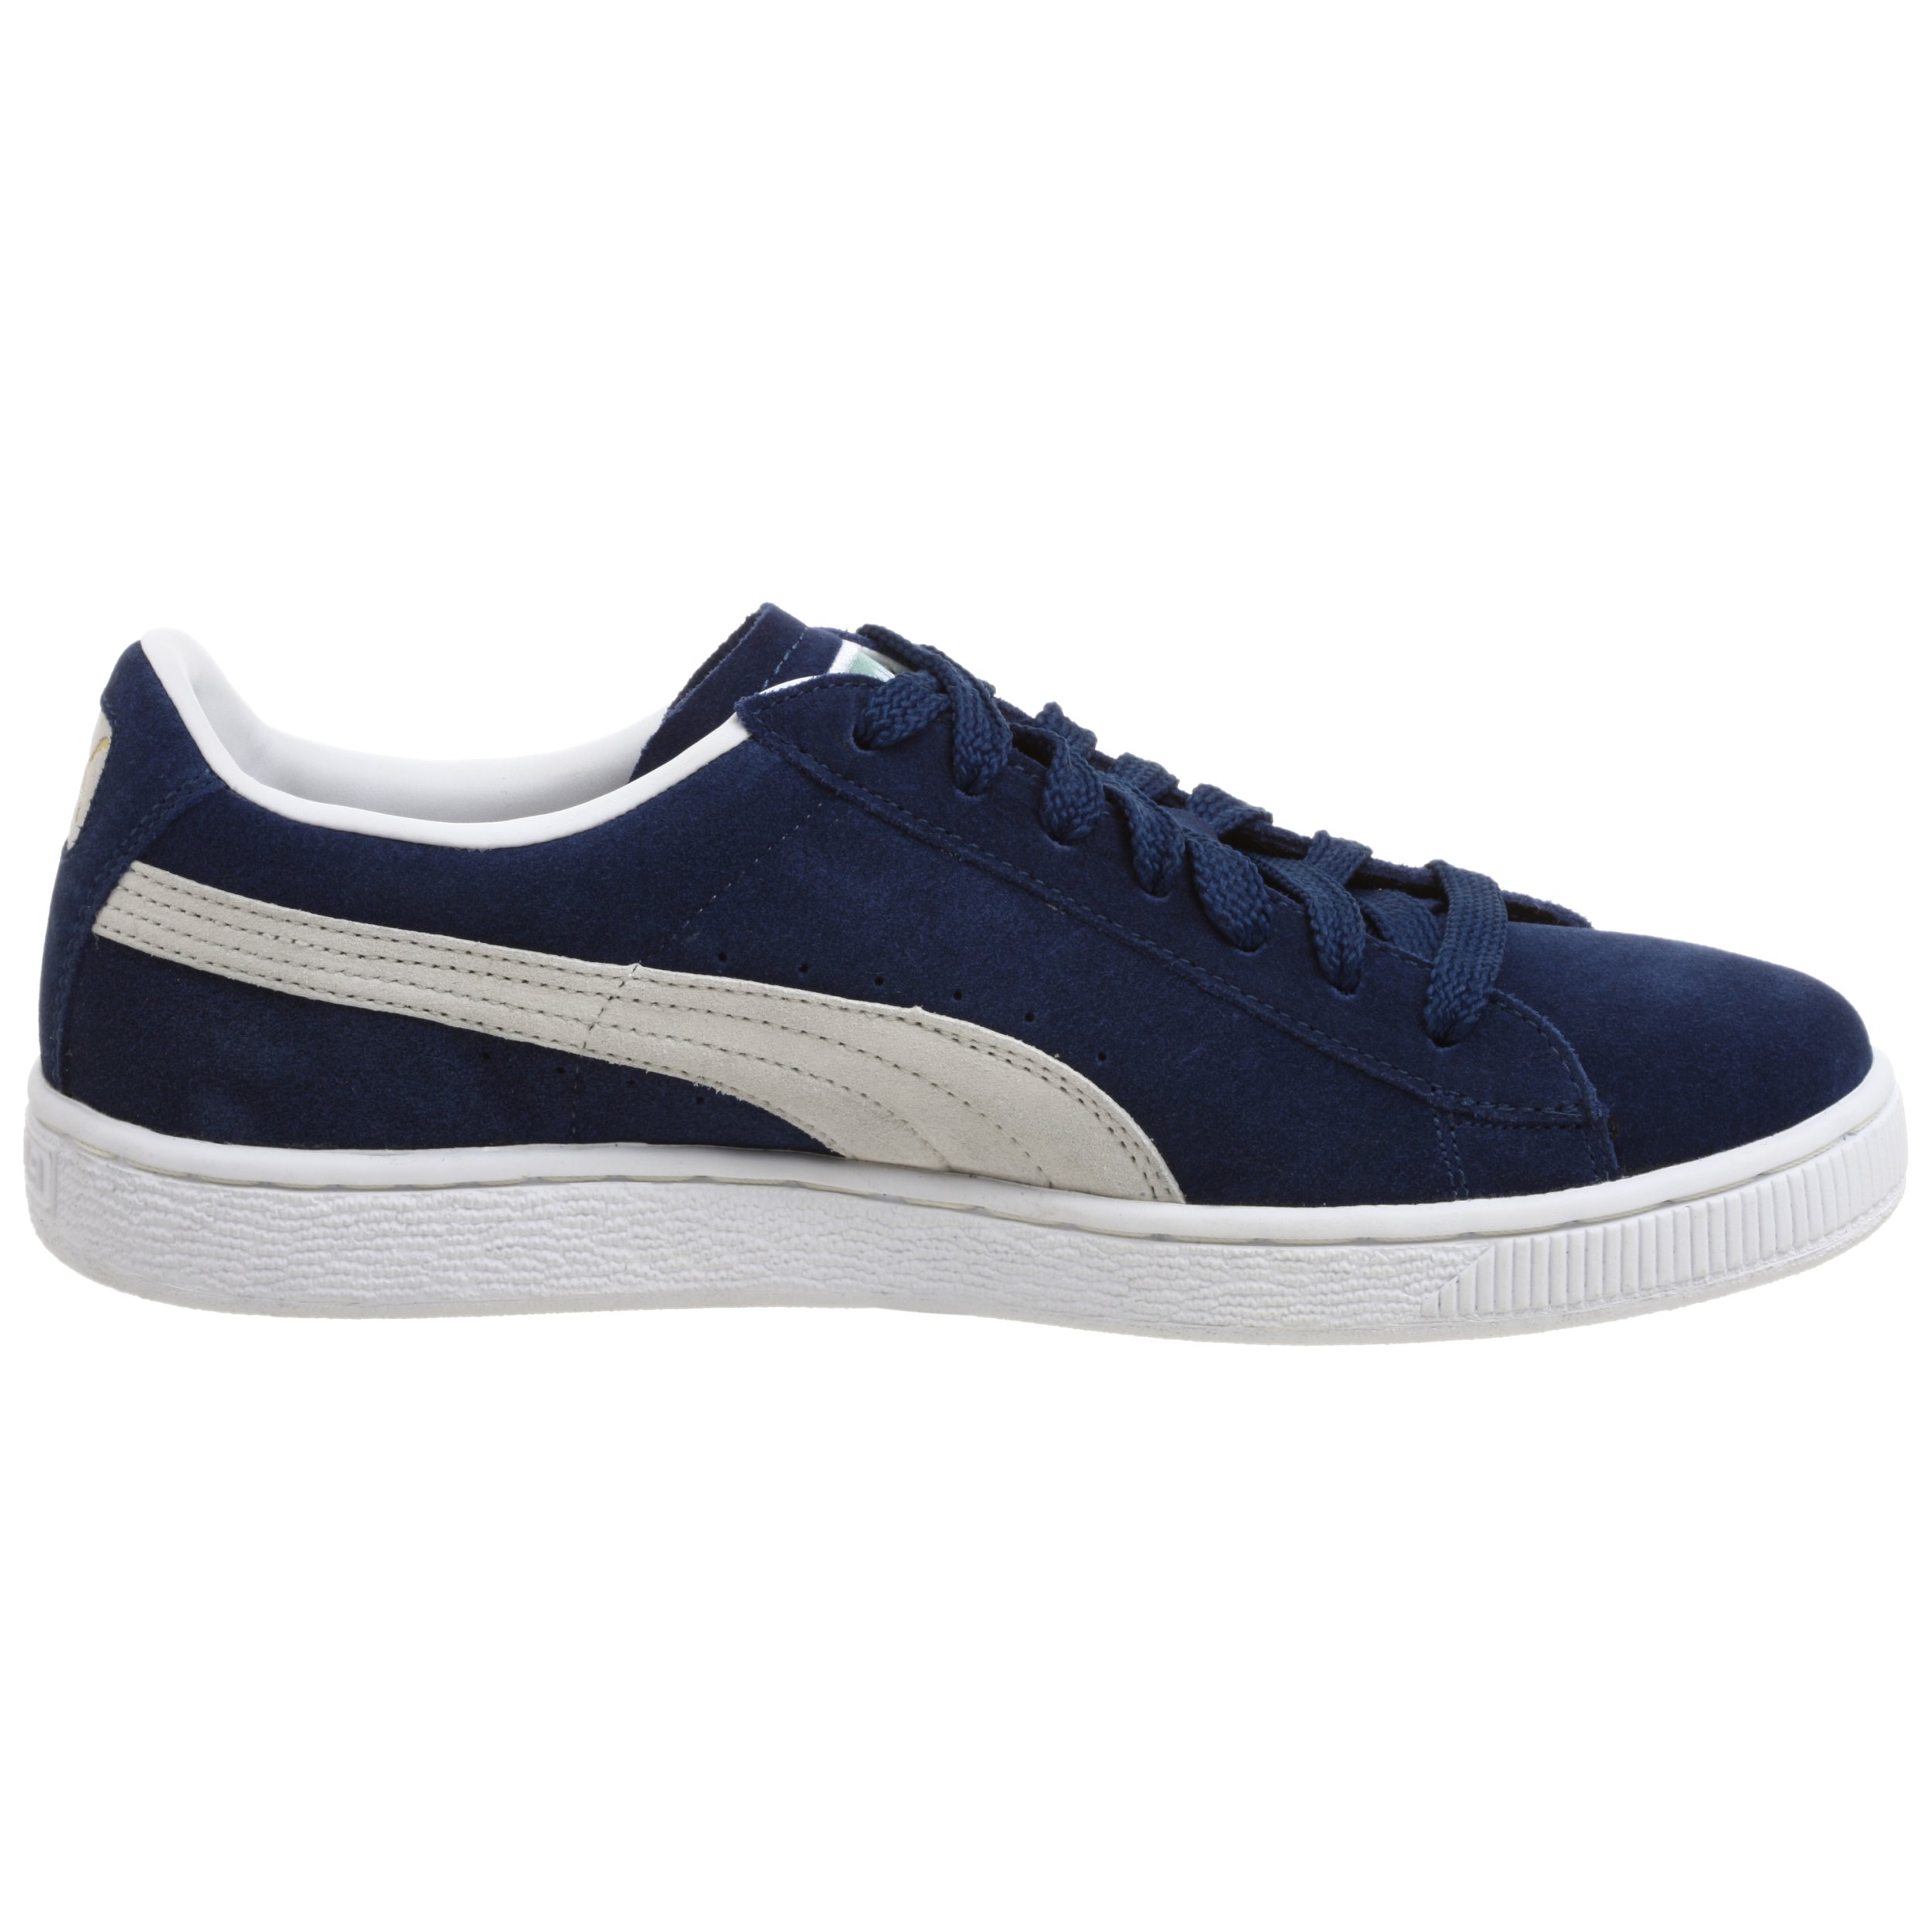 PUMA Suede Classic Sneaker,Blue/White,8 M US Men's by PUMA (Image #6)